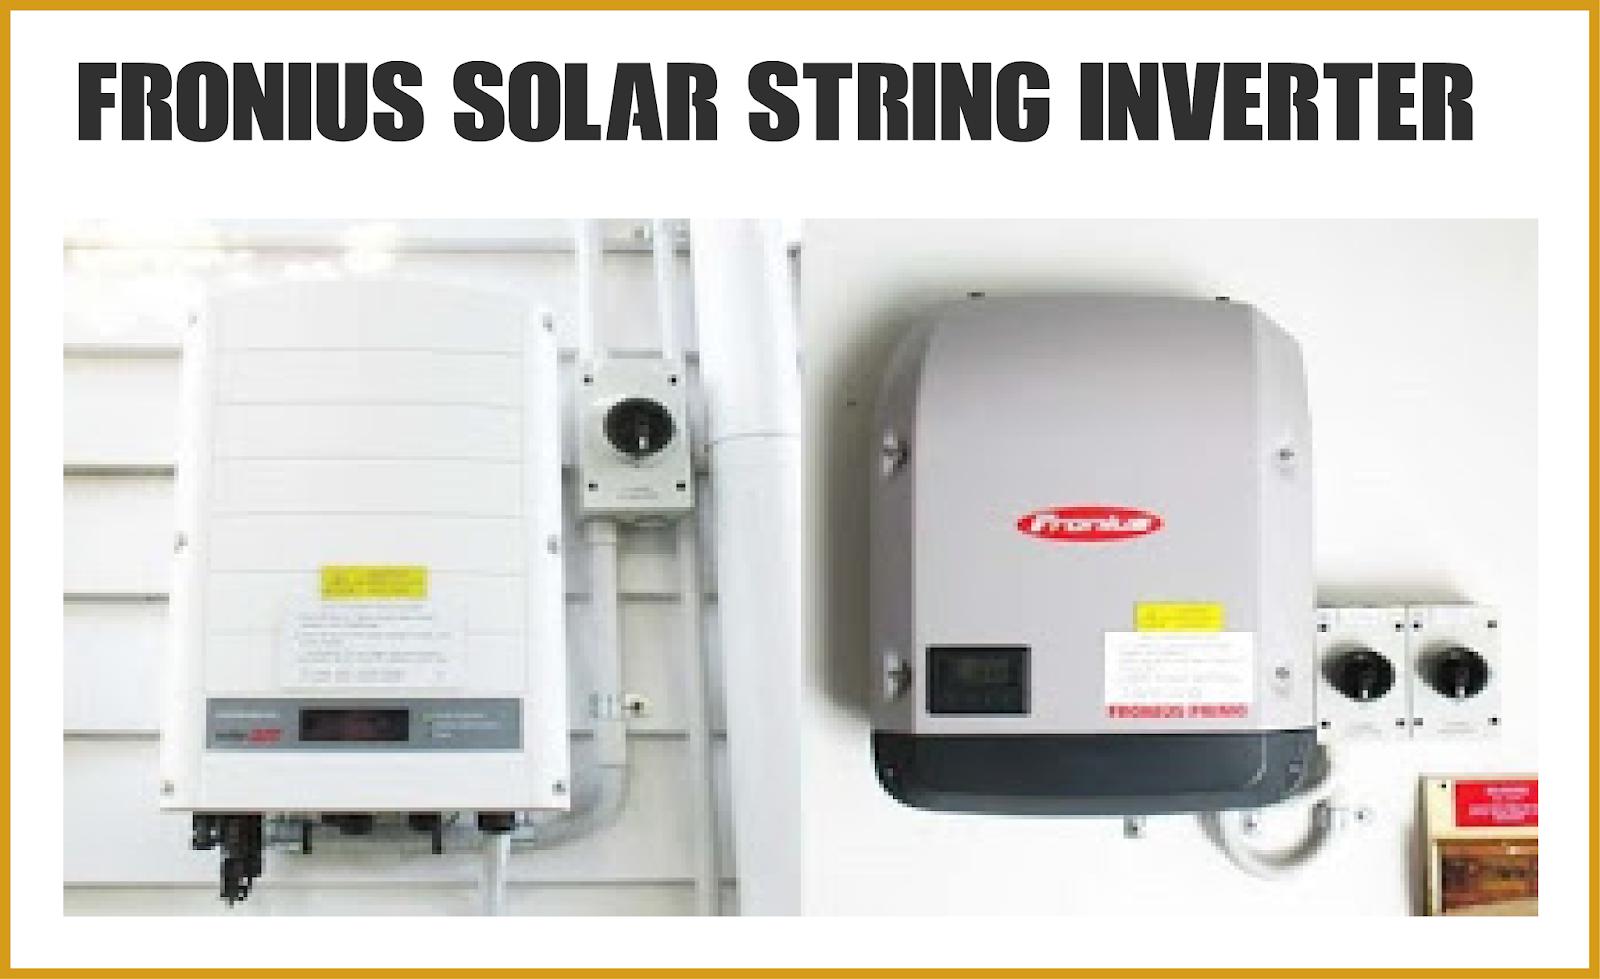 Fronius Solar String Inverter User Manual